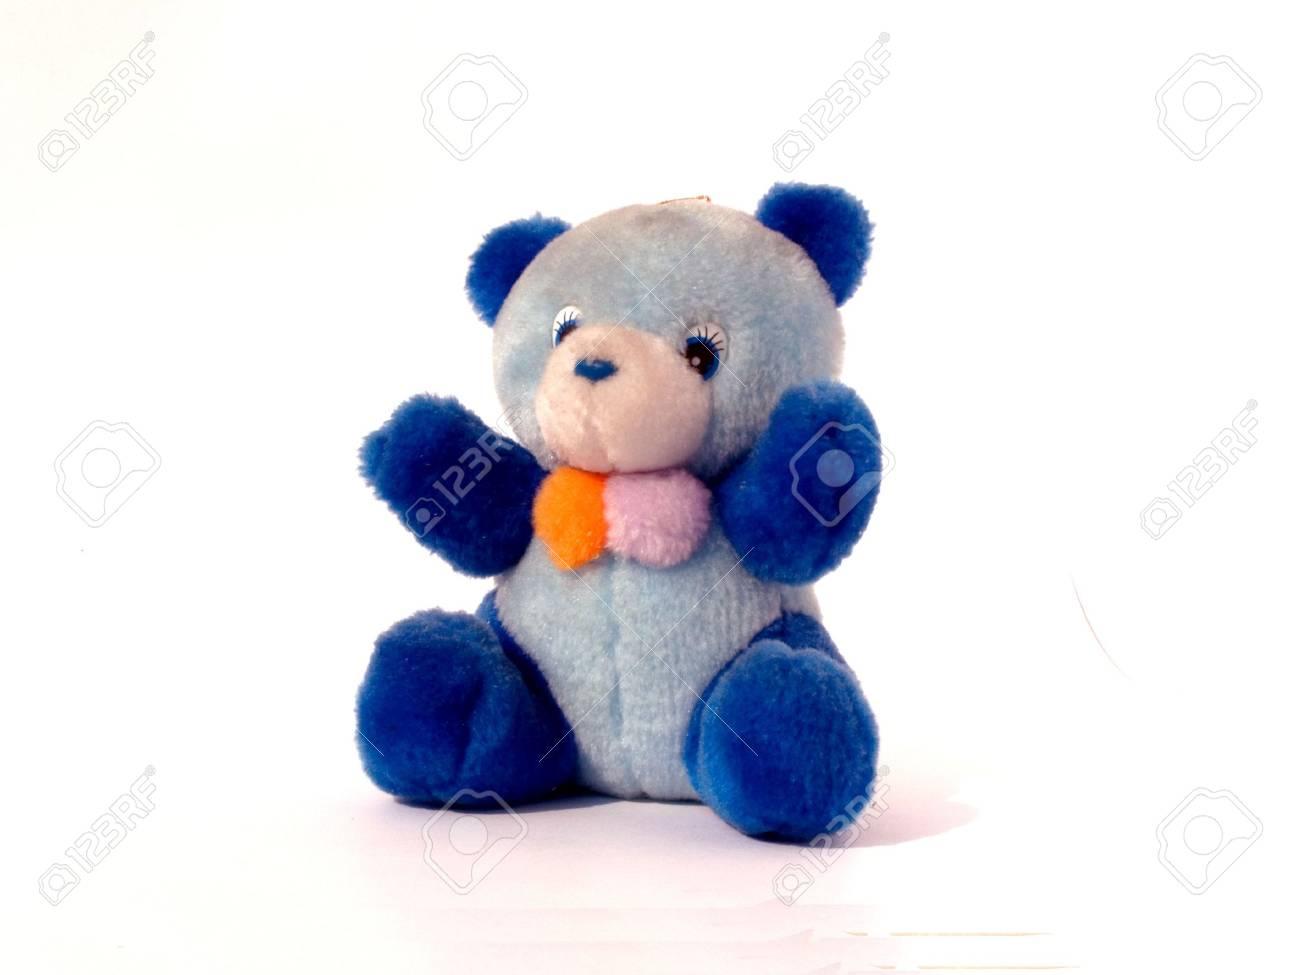 stuffed bear - 2057647